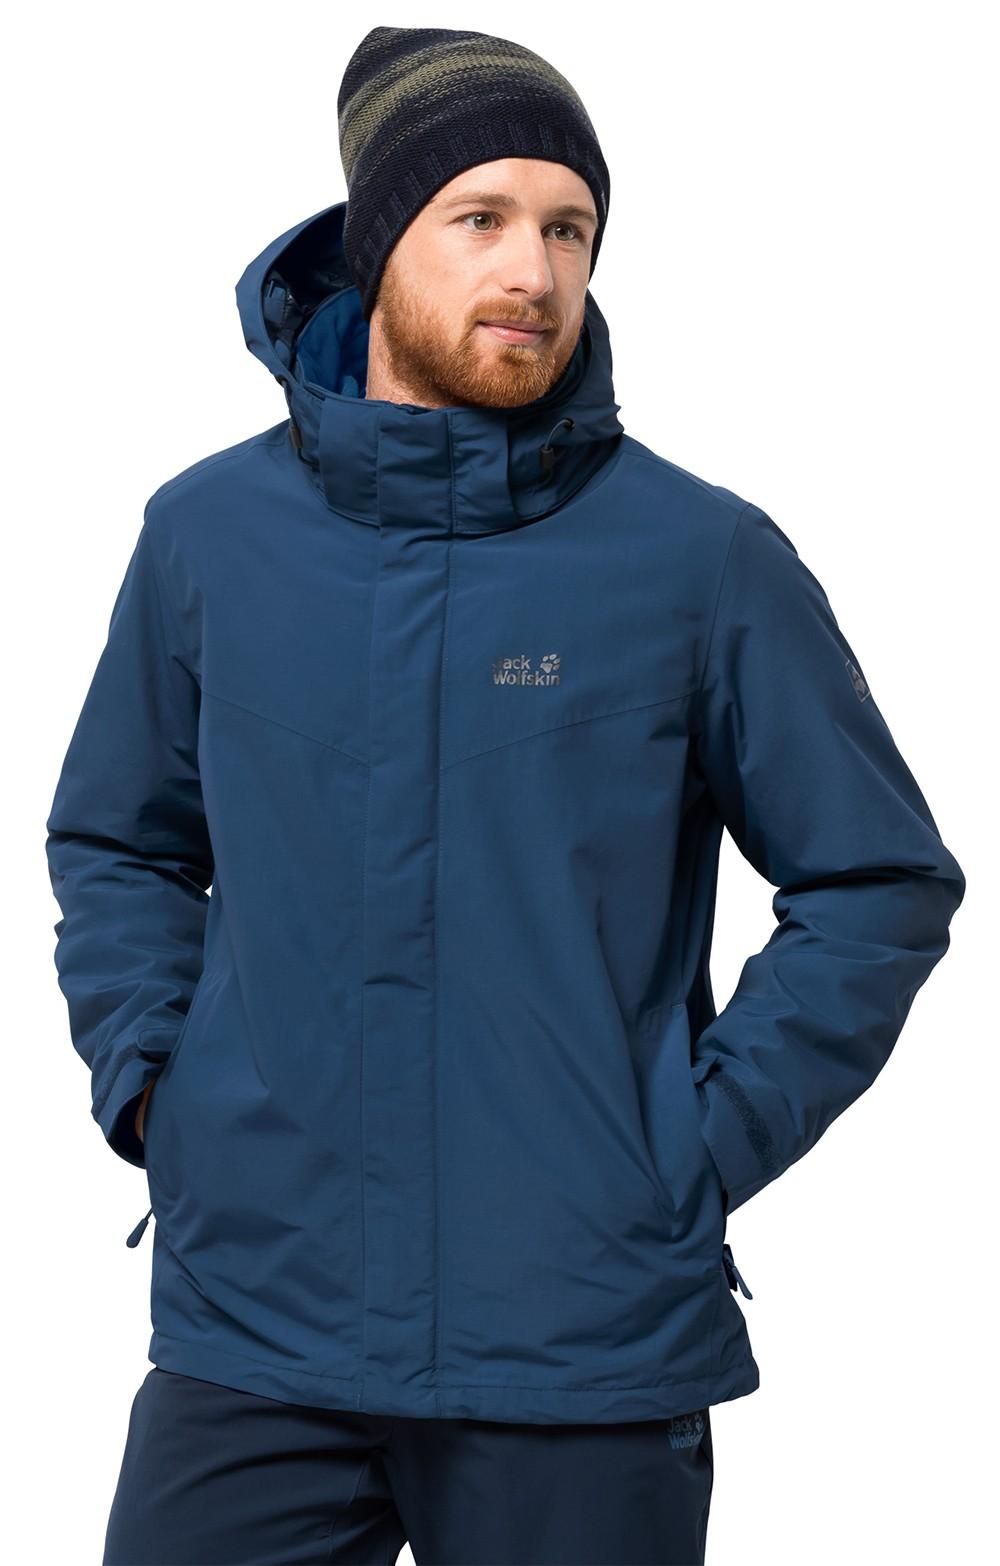 outlet store 37f76 a8ff6 Men's Jack Wolfskin Gotland 3-in-1 Jacket